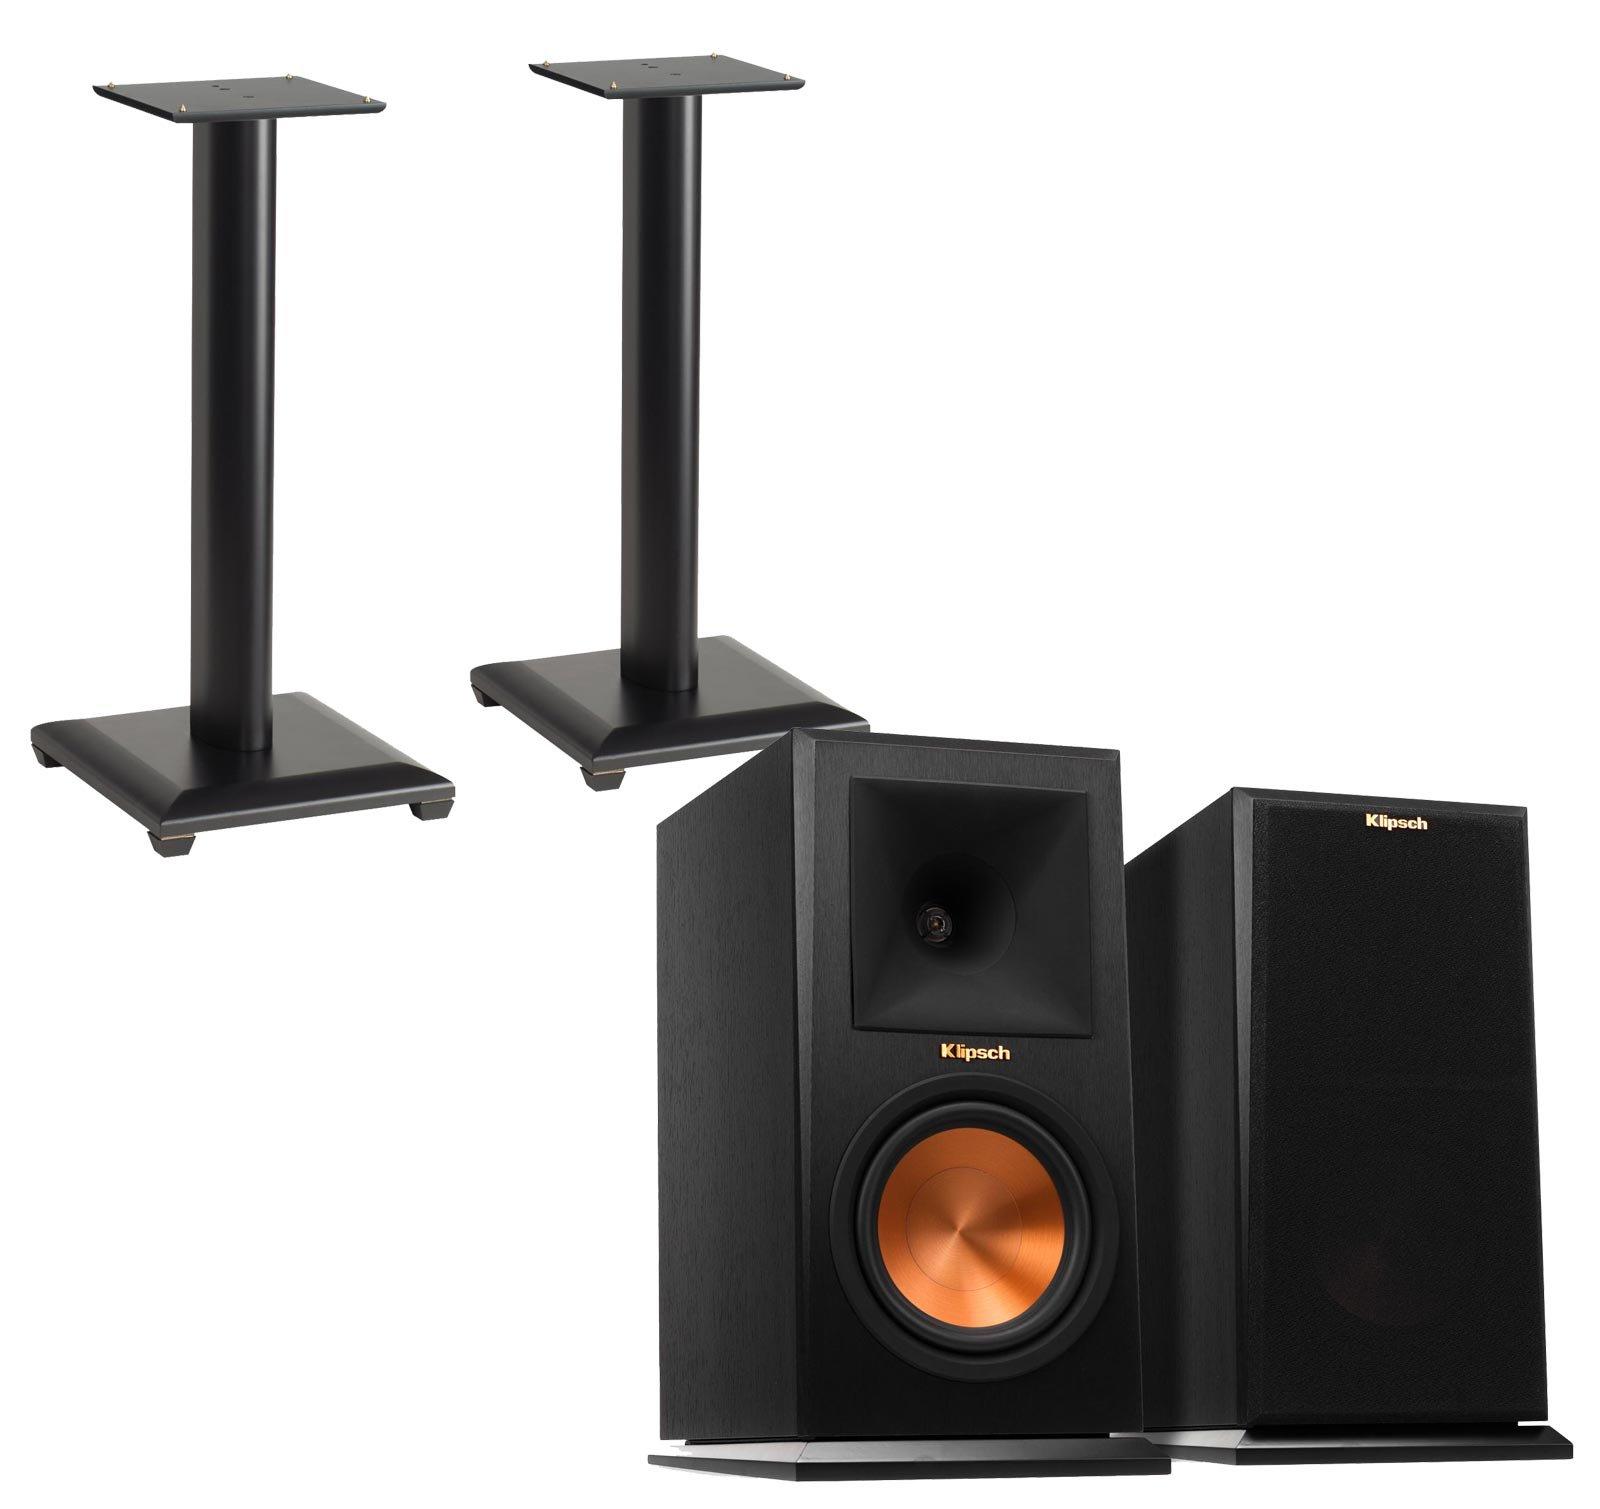 Klipsch Reference Premiere RP160M (Pair) Bookshelf Speakers with Sanus NF24B (Pair) Bookshelf Speaker Stands - Ebony